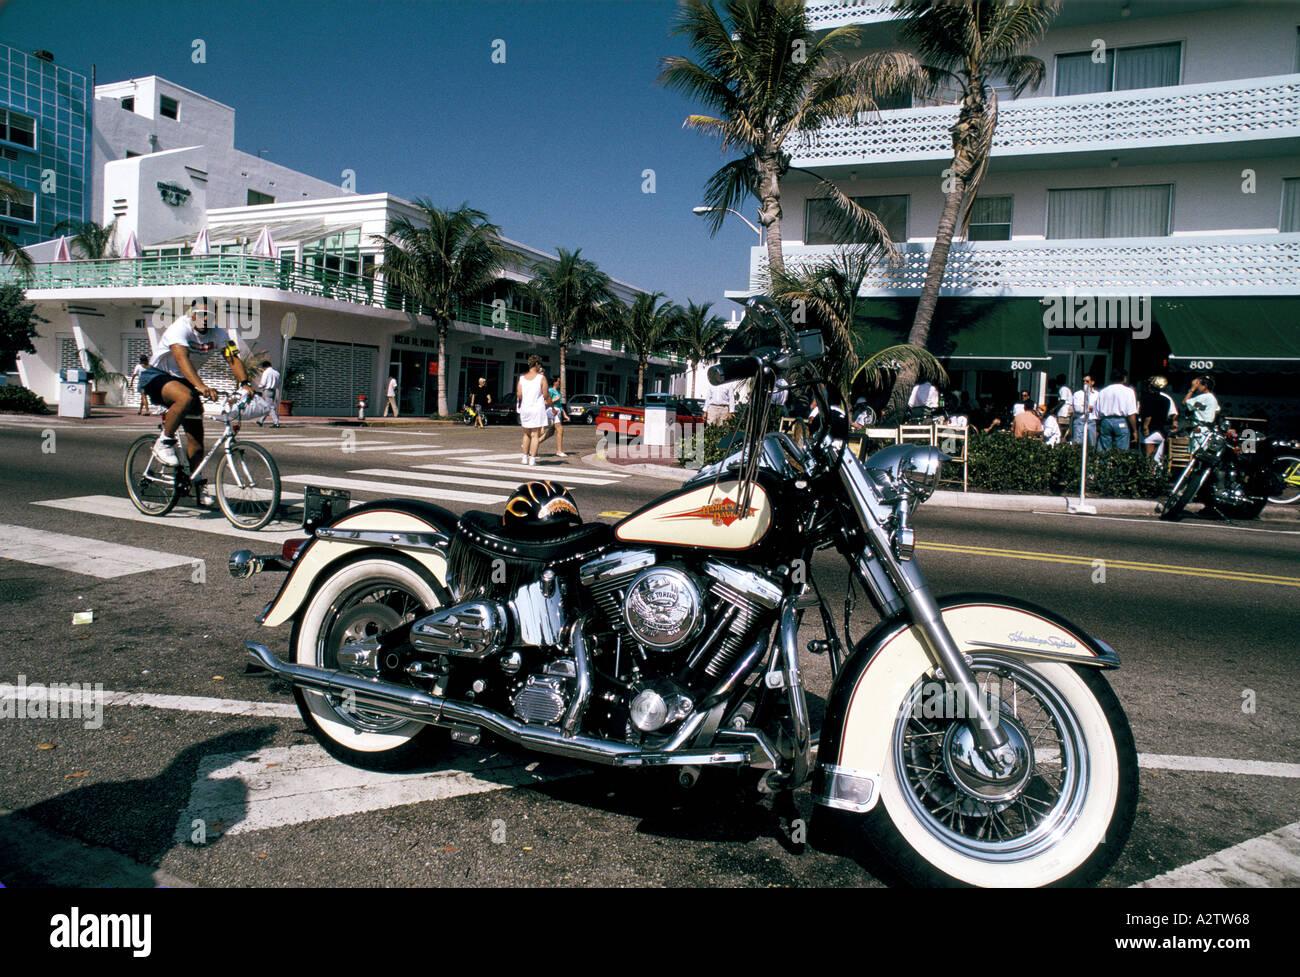 harley davidson ocean drive miami beach florida Stock Photo: 3459431